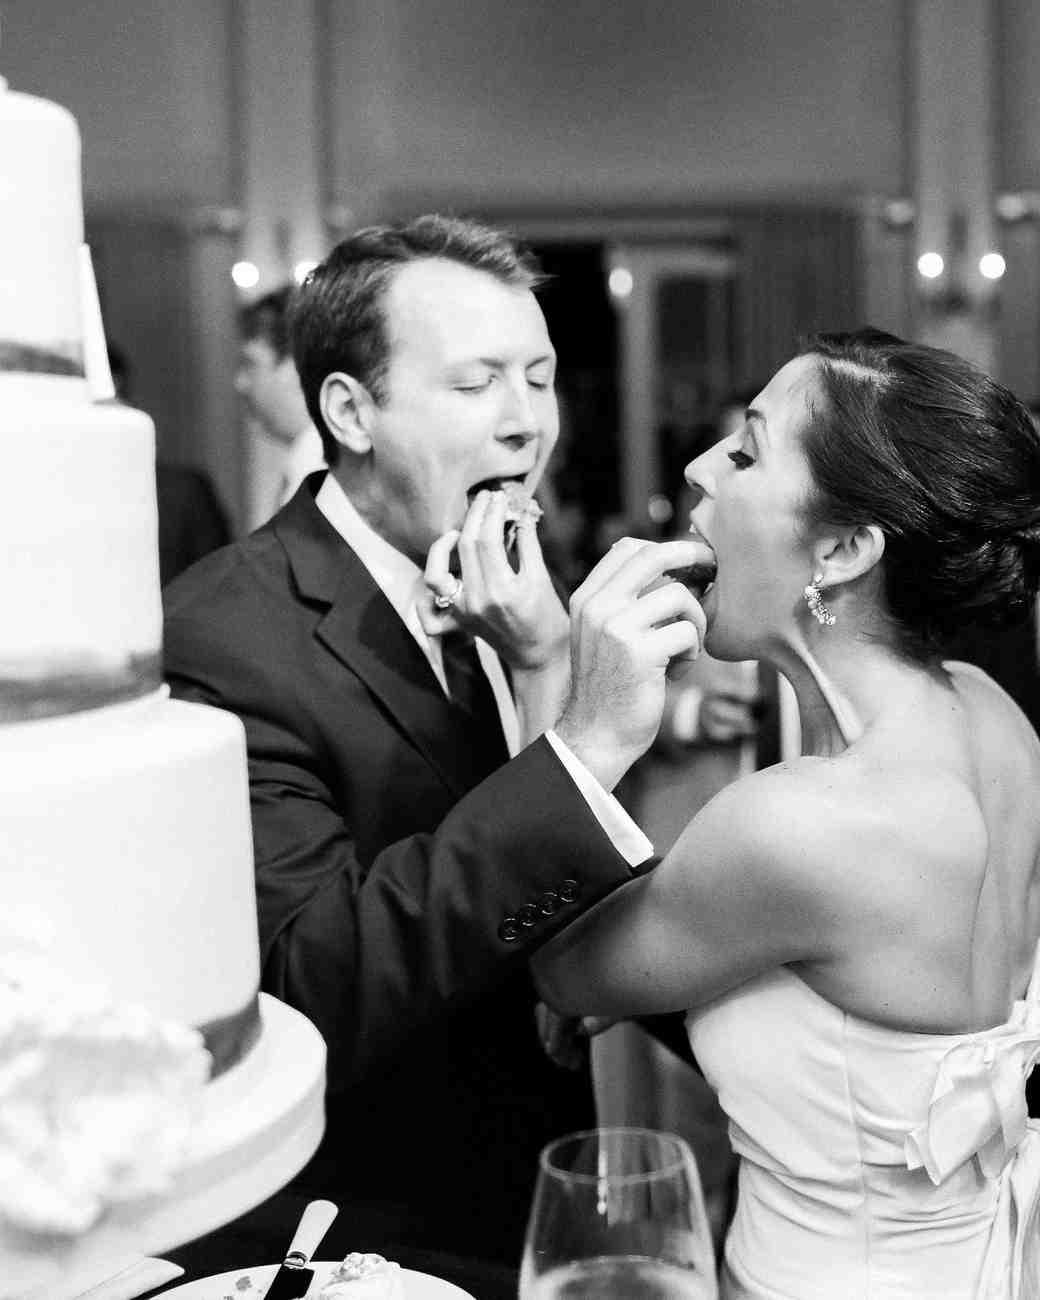 taylor-john-wedding-cake-117-s113035-0616.jpg